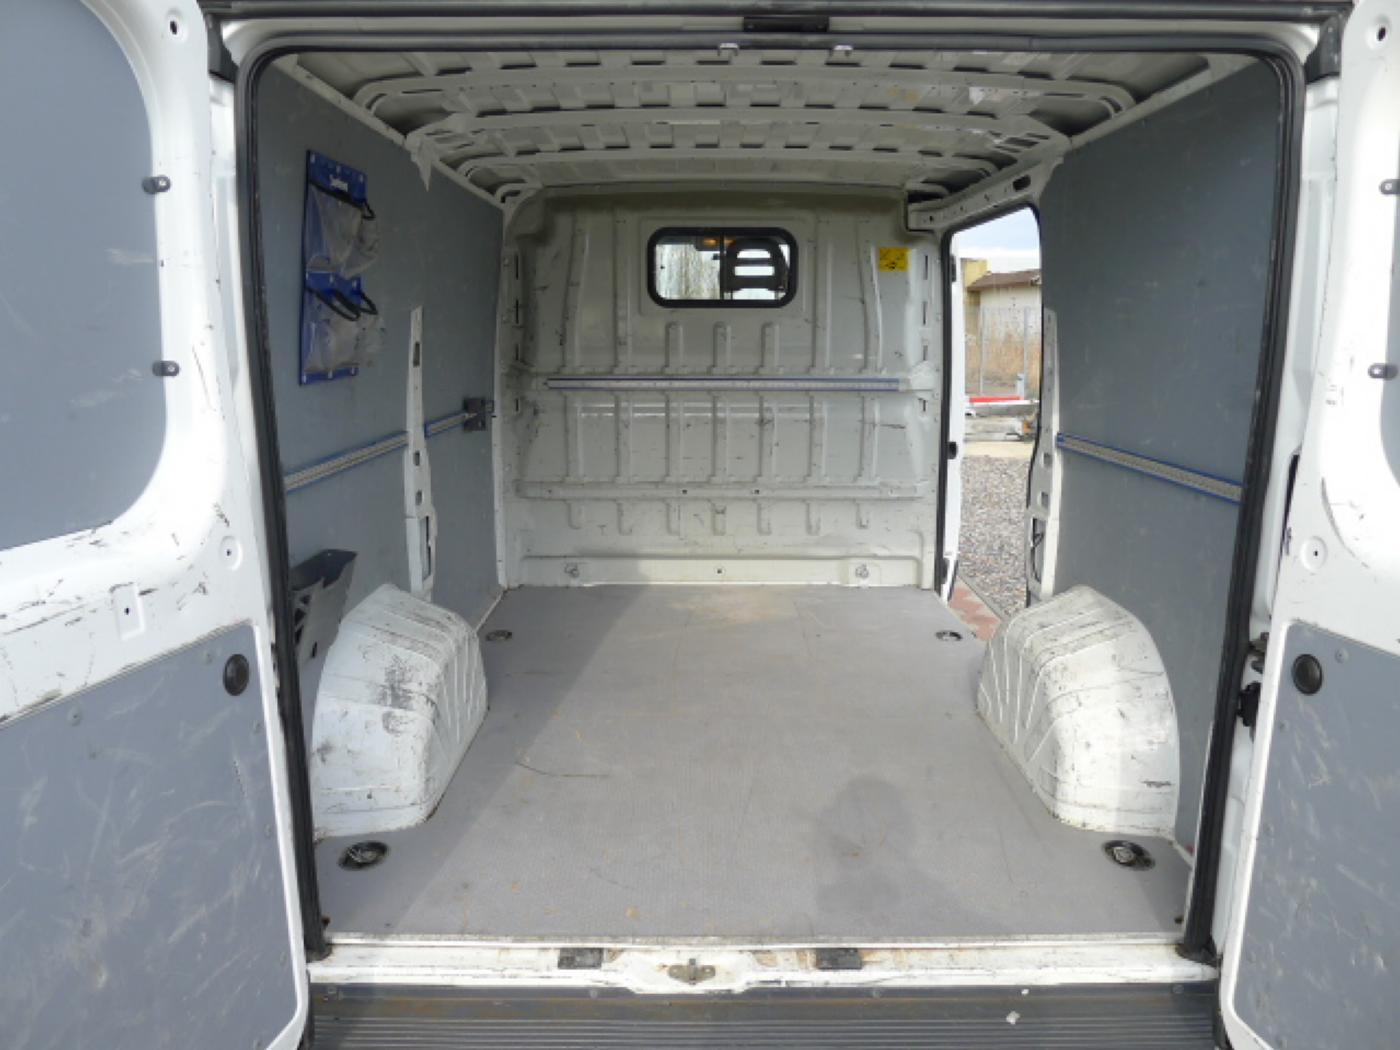 Peugeot Boxer 2.2 HDI L1H1 Klima Akce!!! Novinka - 6